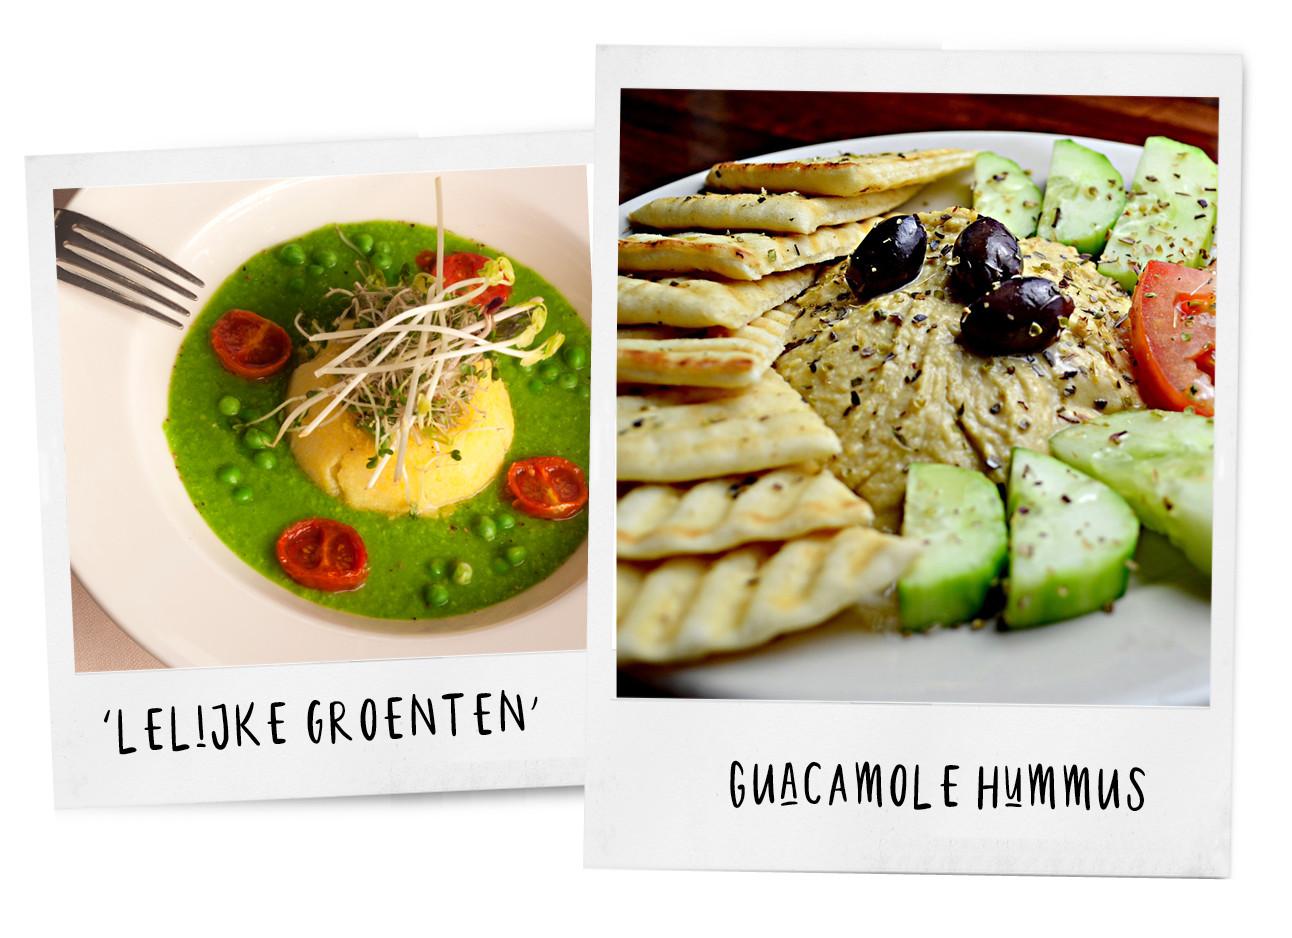 groente soepje en guacamole hummus